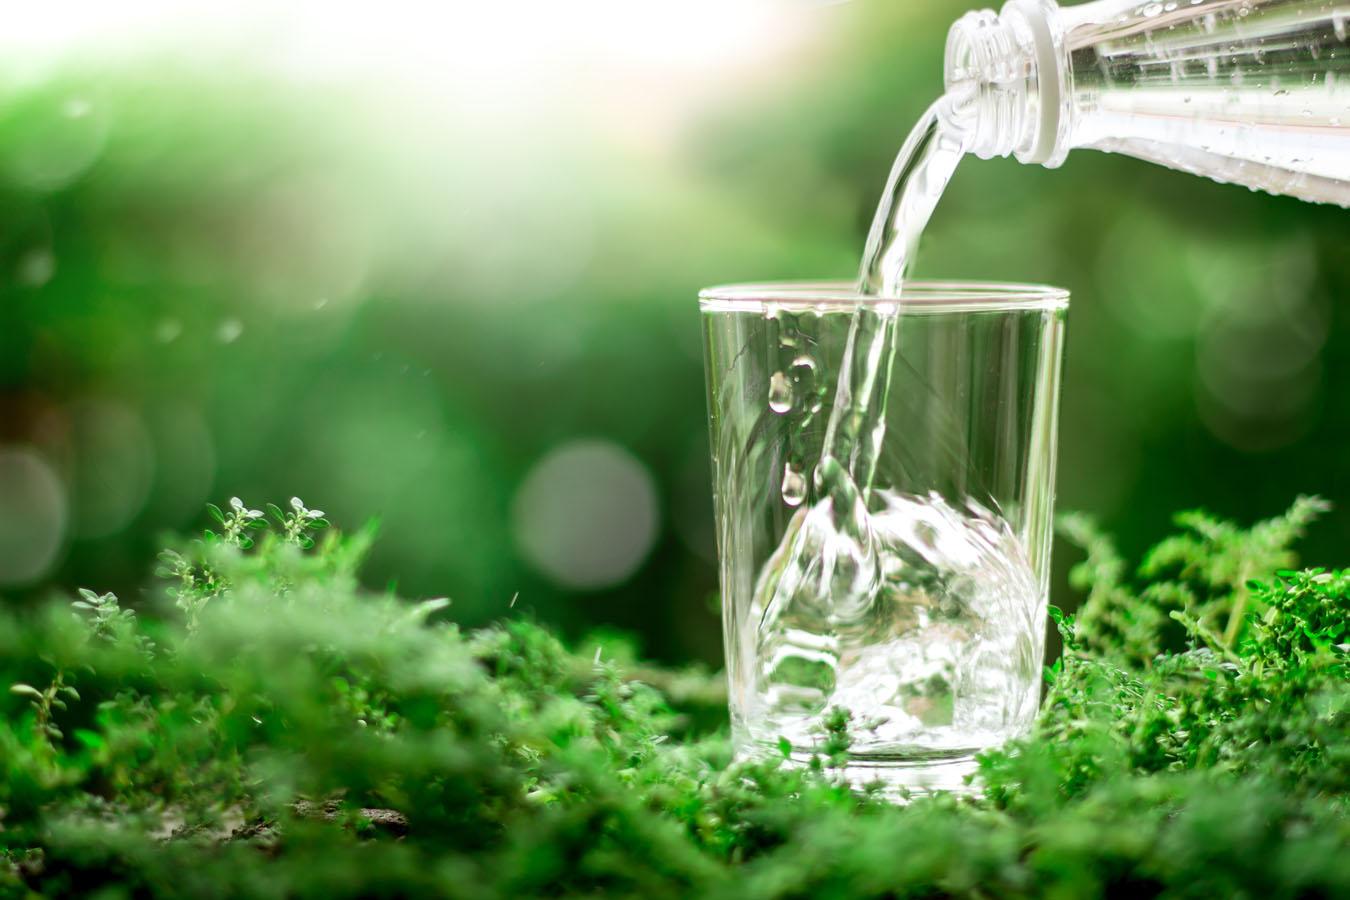 glass-of-water-in-greens-1350.jpg